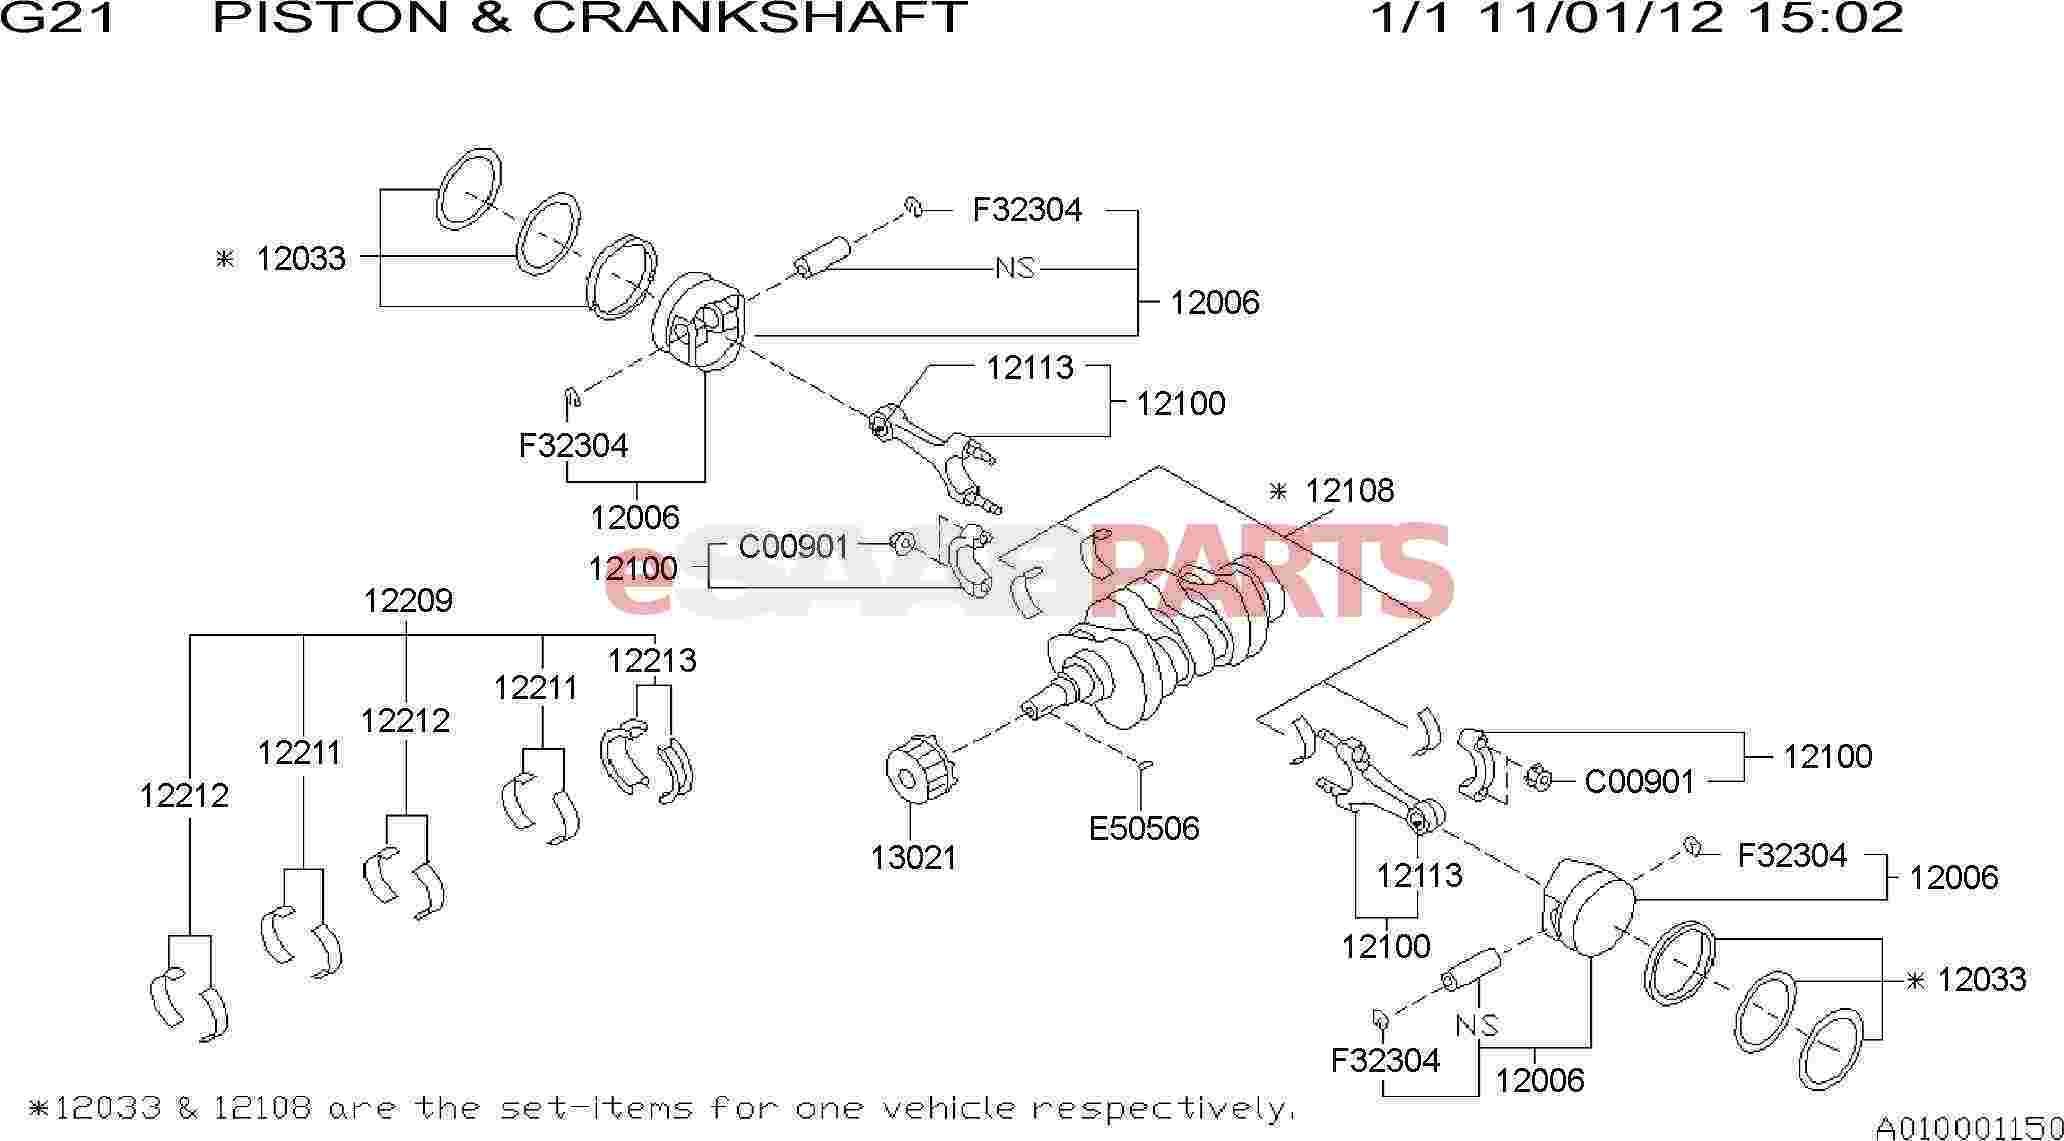 Saab Piston Ring Set